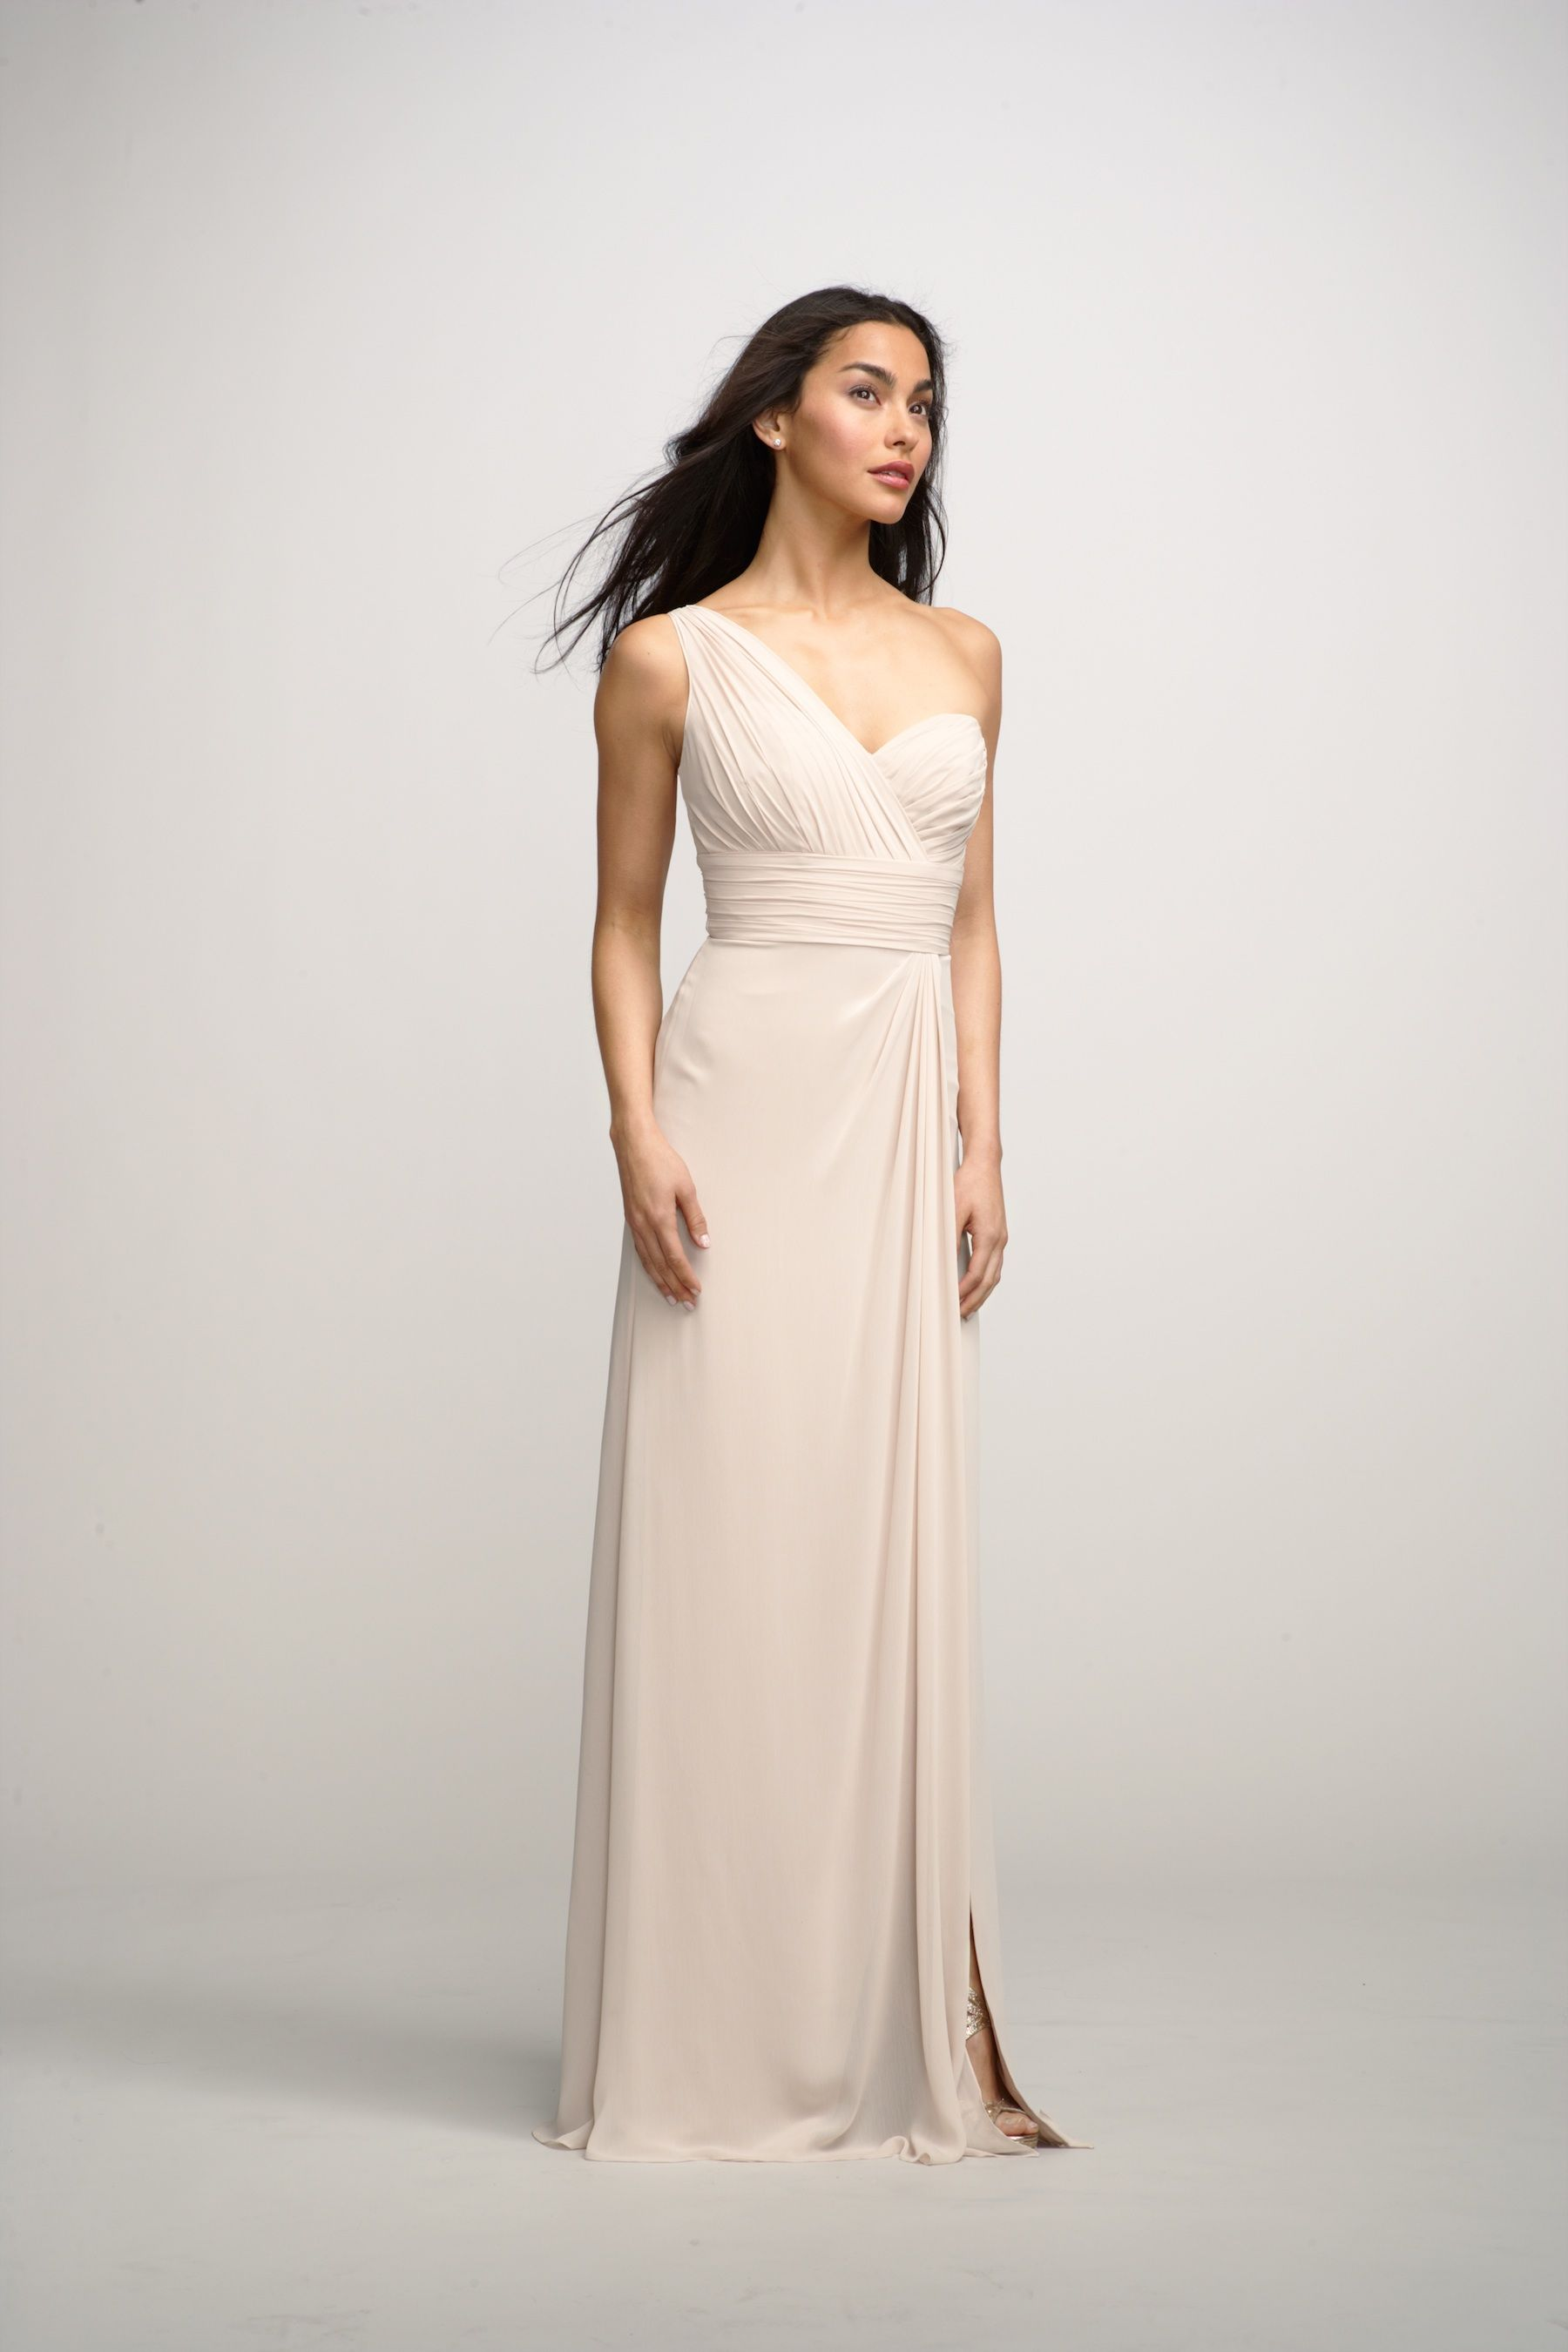 Cream colored vintage wedding dresses  Cream colored bridesmaid dress  Bridesmaid ideas  Pinterest